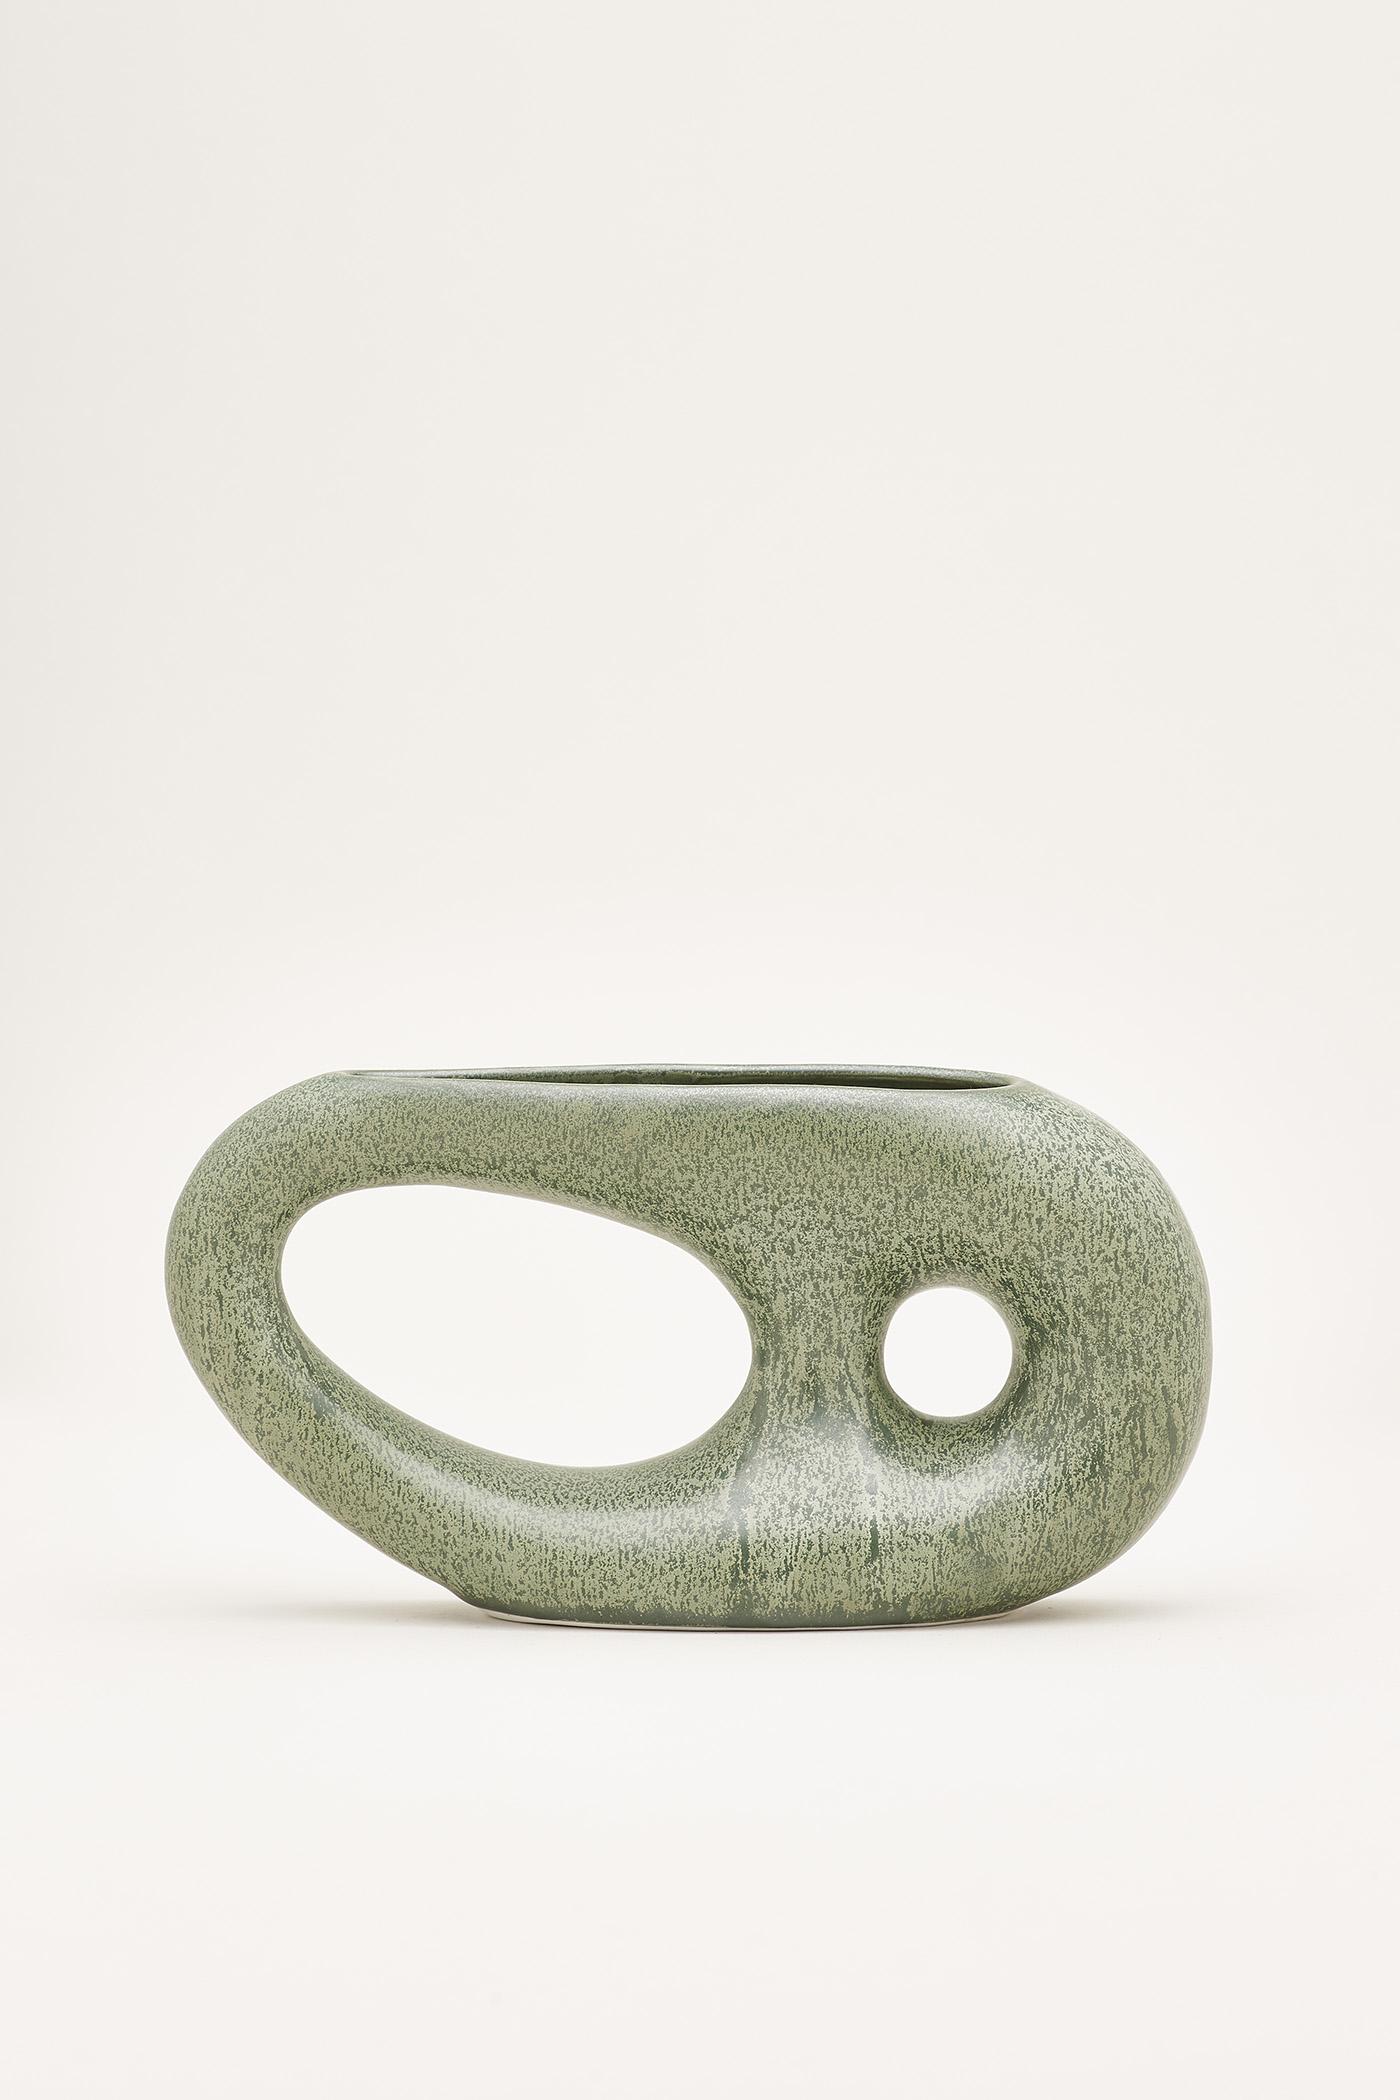 Rief Irregular Vase